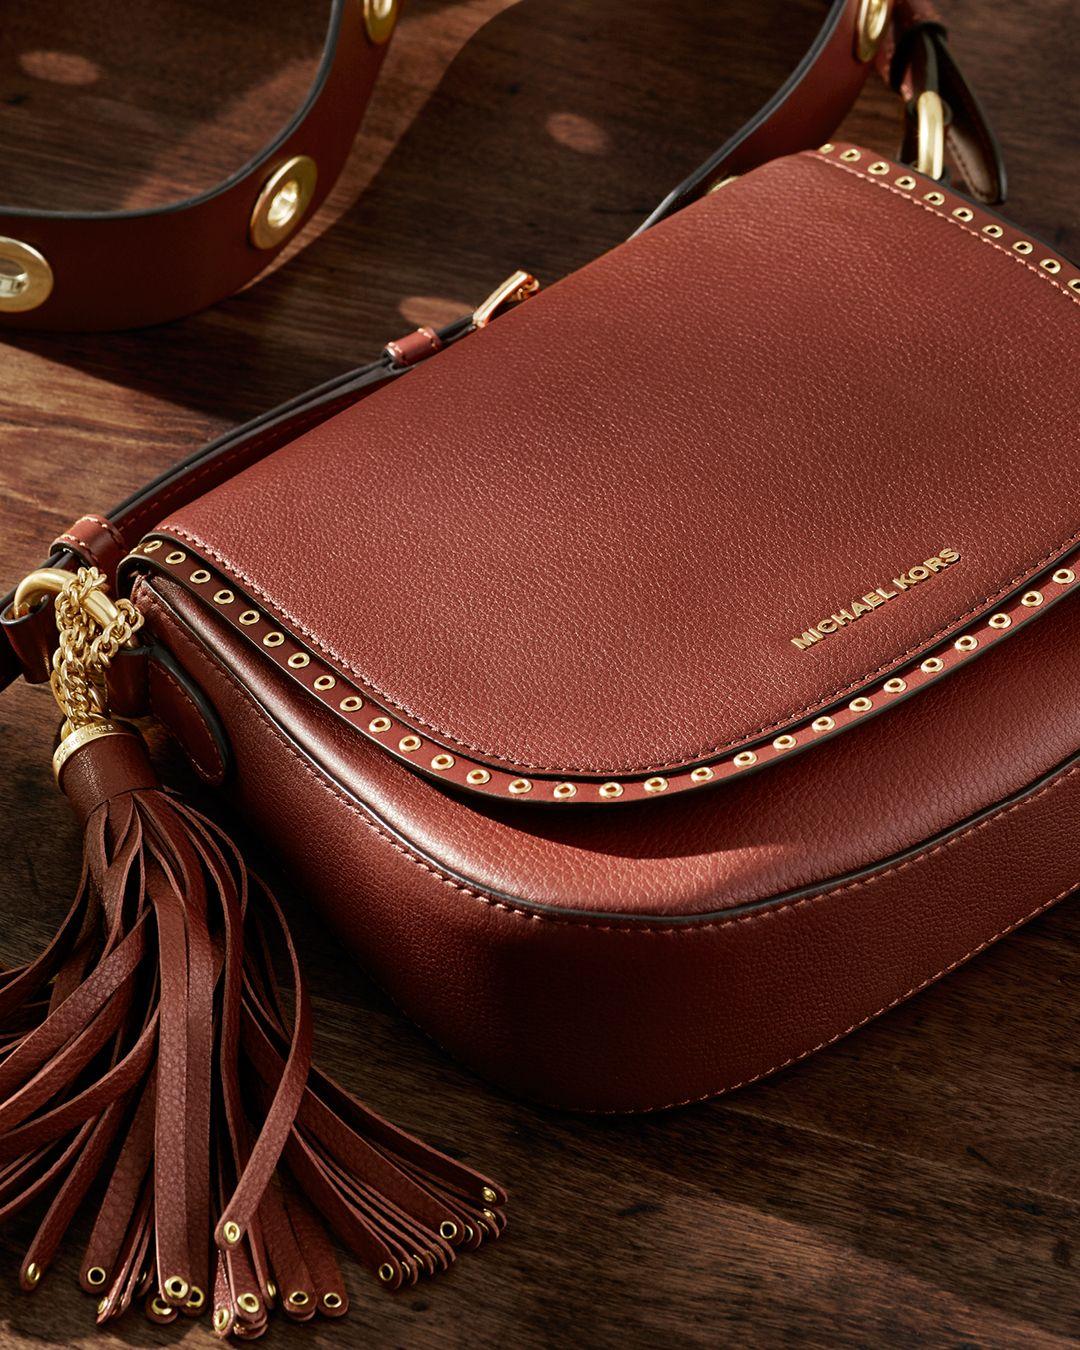 Brooklyn Medium Leather Saddlebag | Michael Kors | レザーの